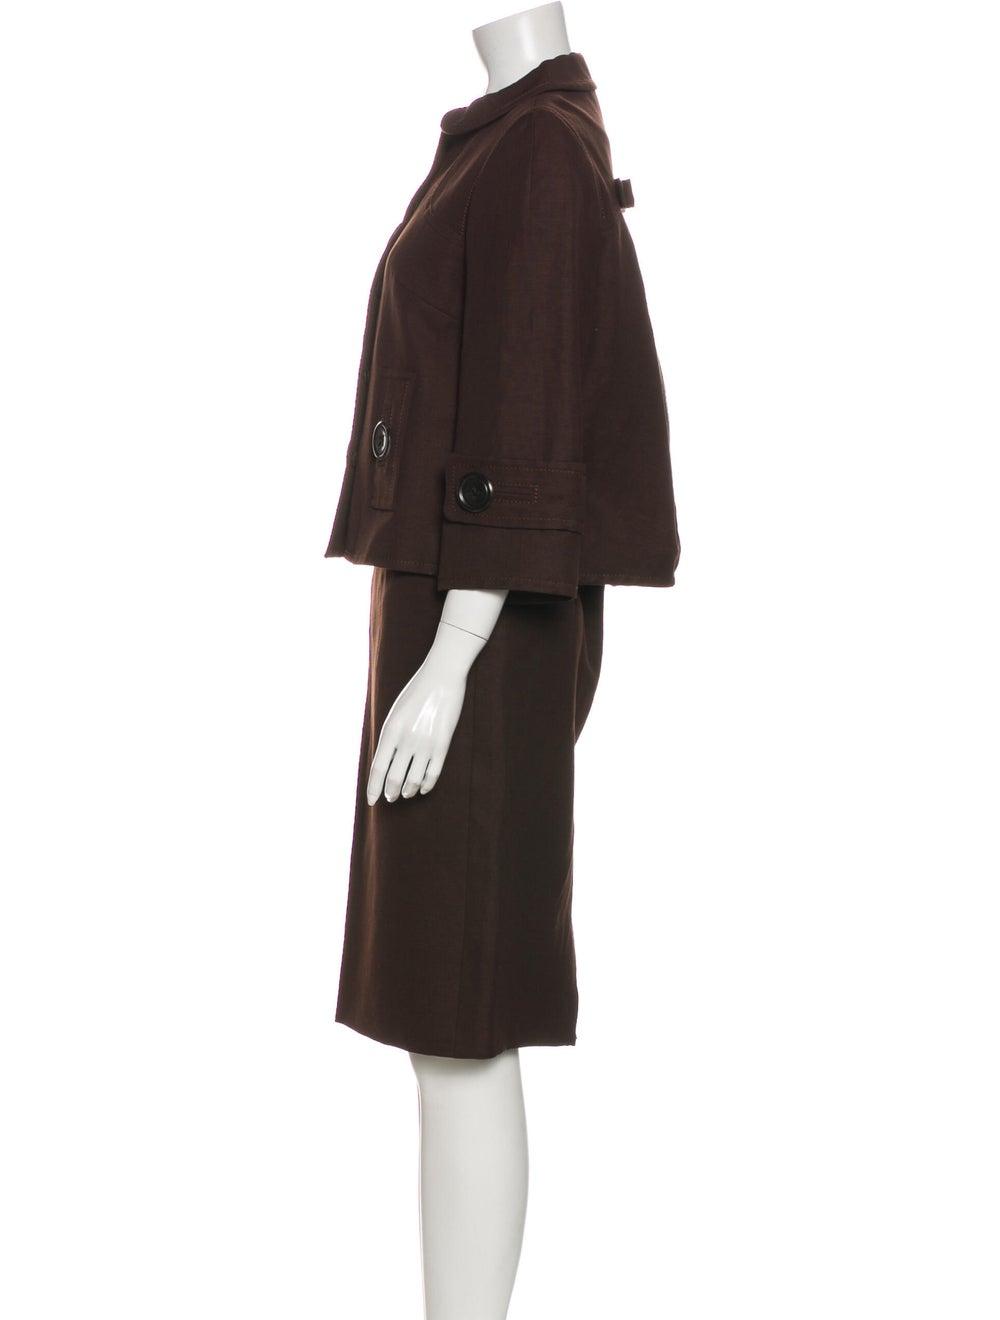 Andrew Gn Linen Skirt Suit Brown - image 2